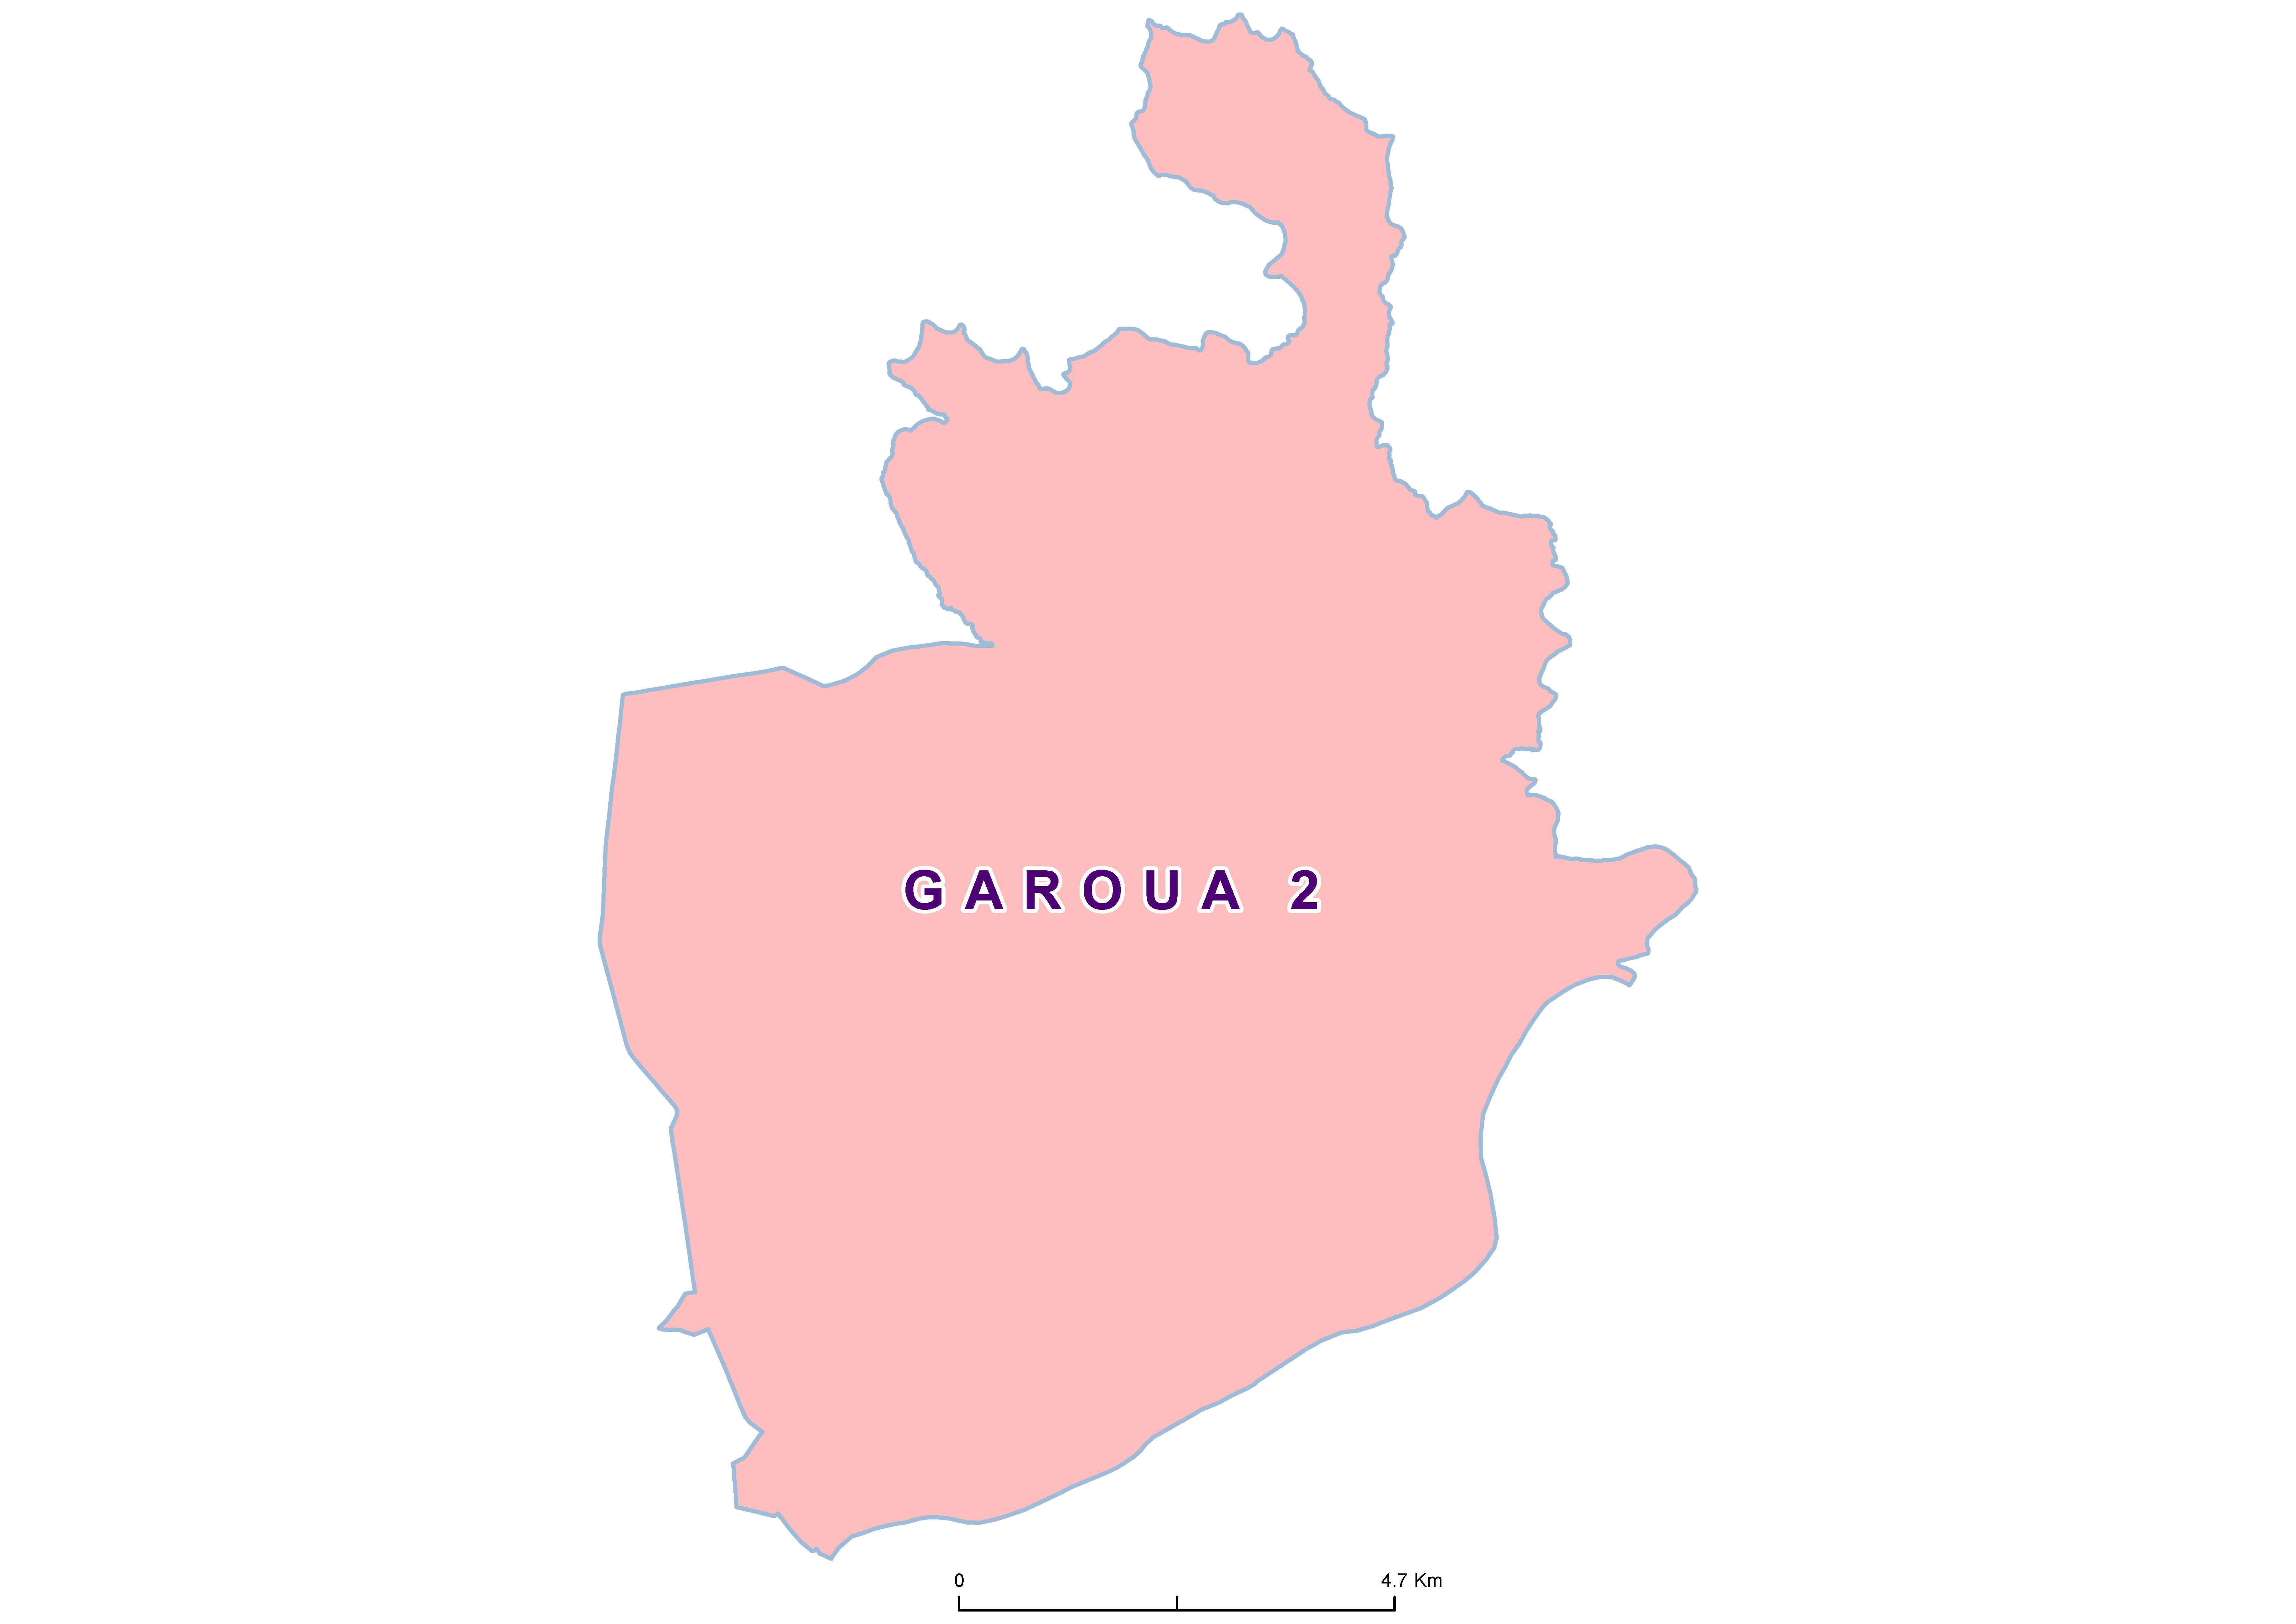 Garoua 2 Mean SCH 20100001